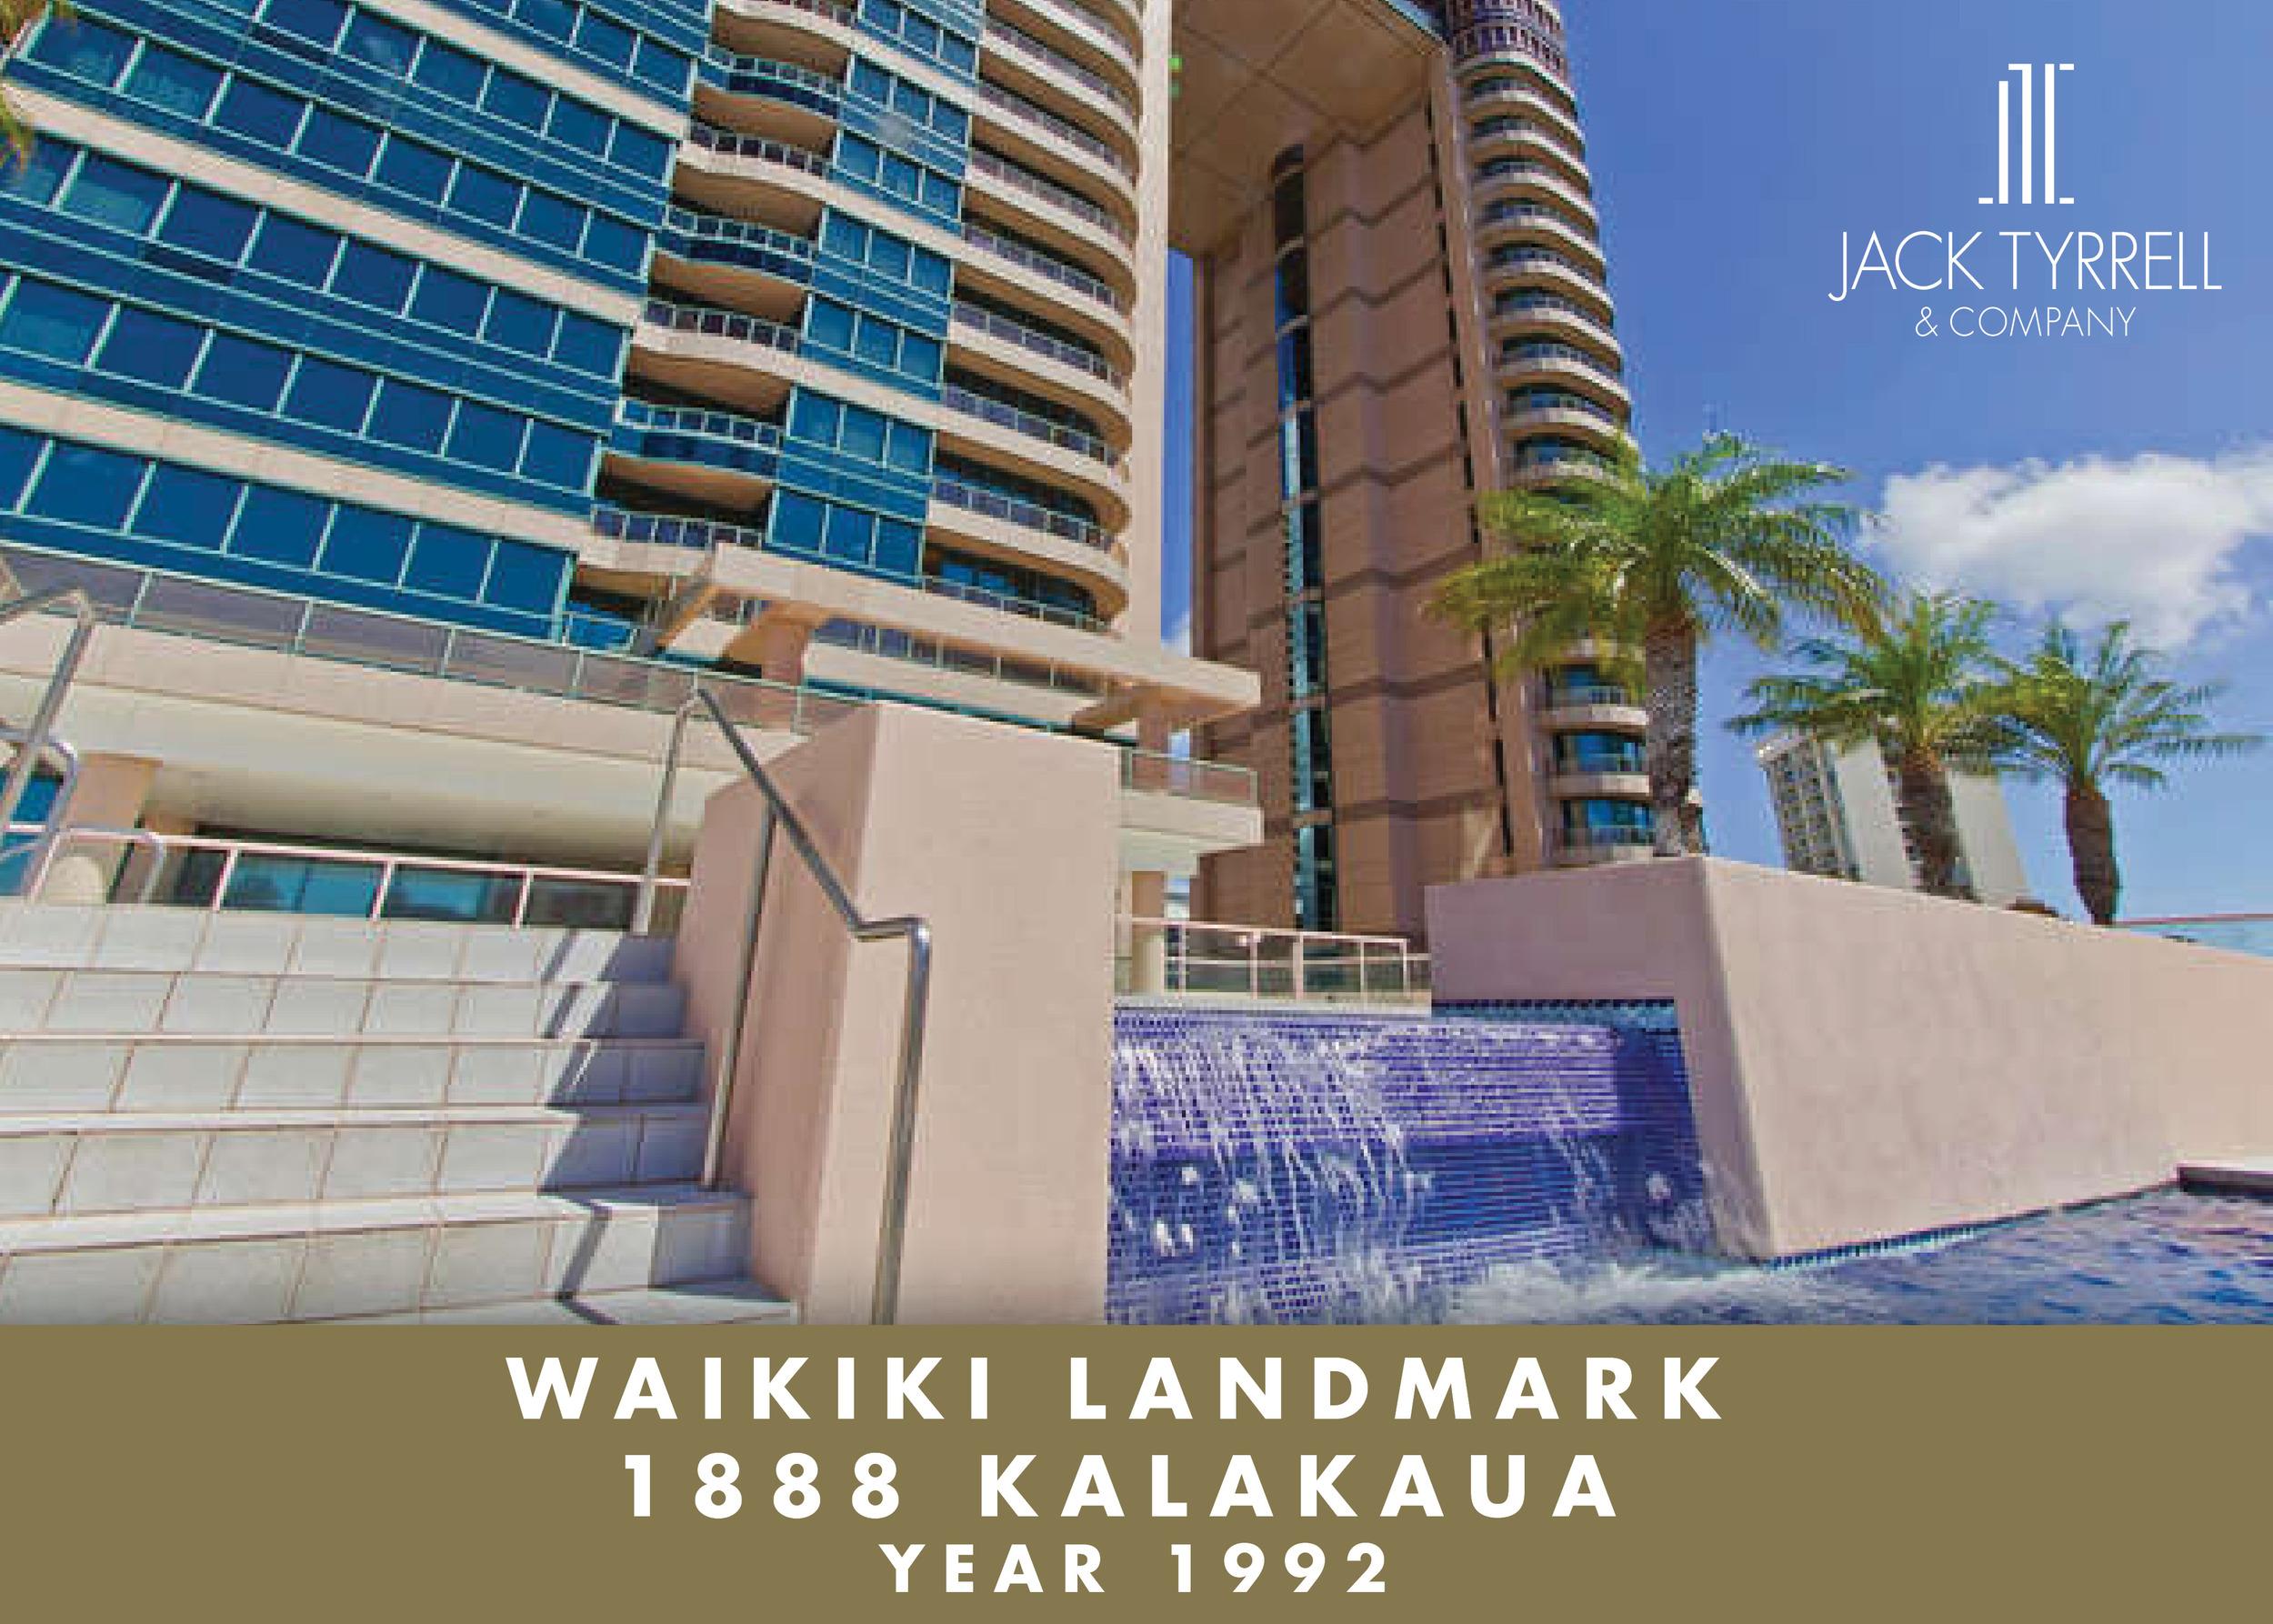 Waikiki Landmark - Gateway to Waikiki